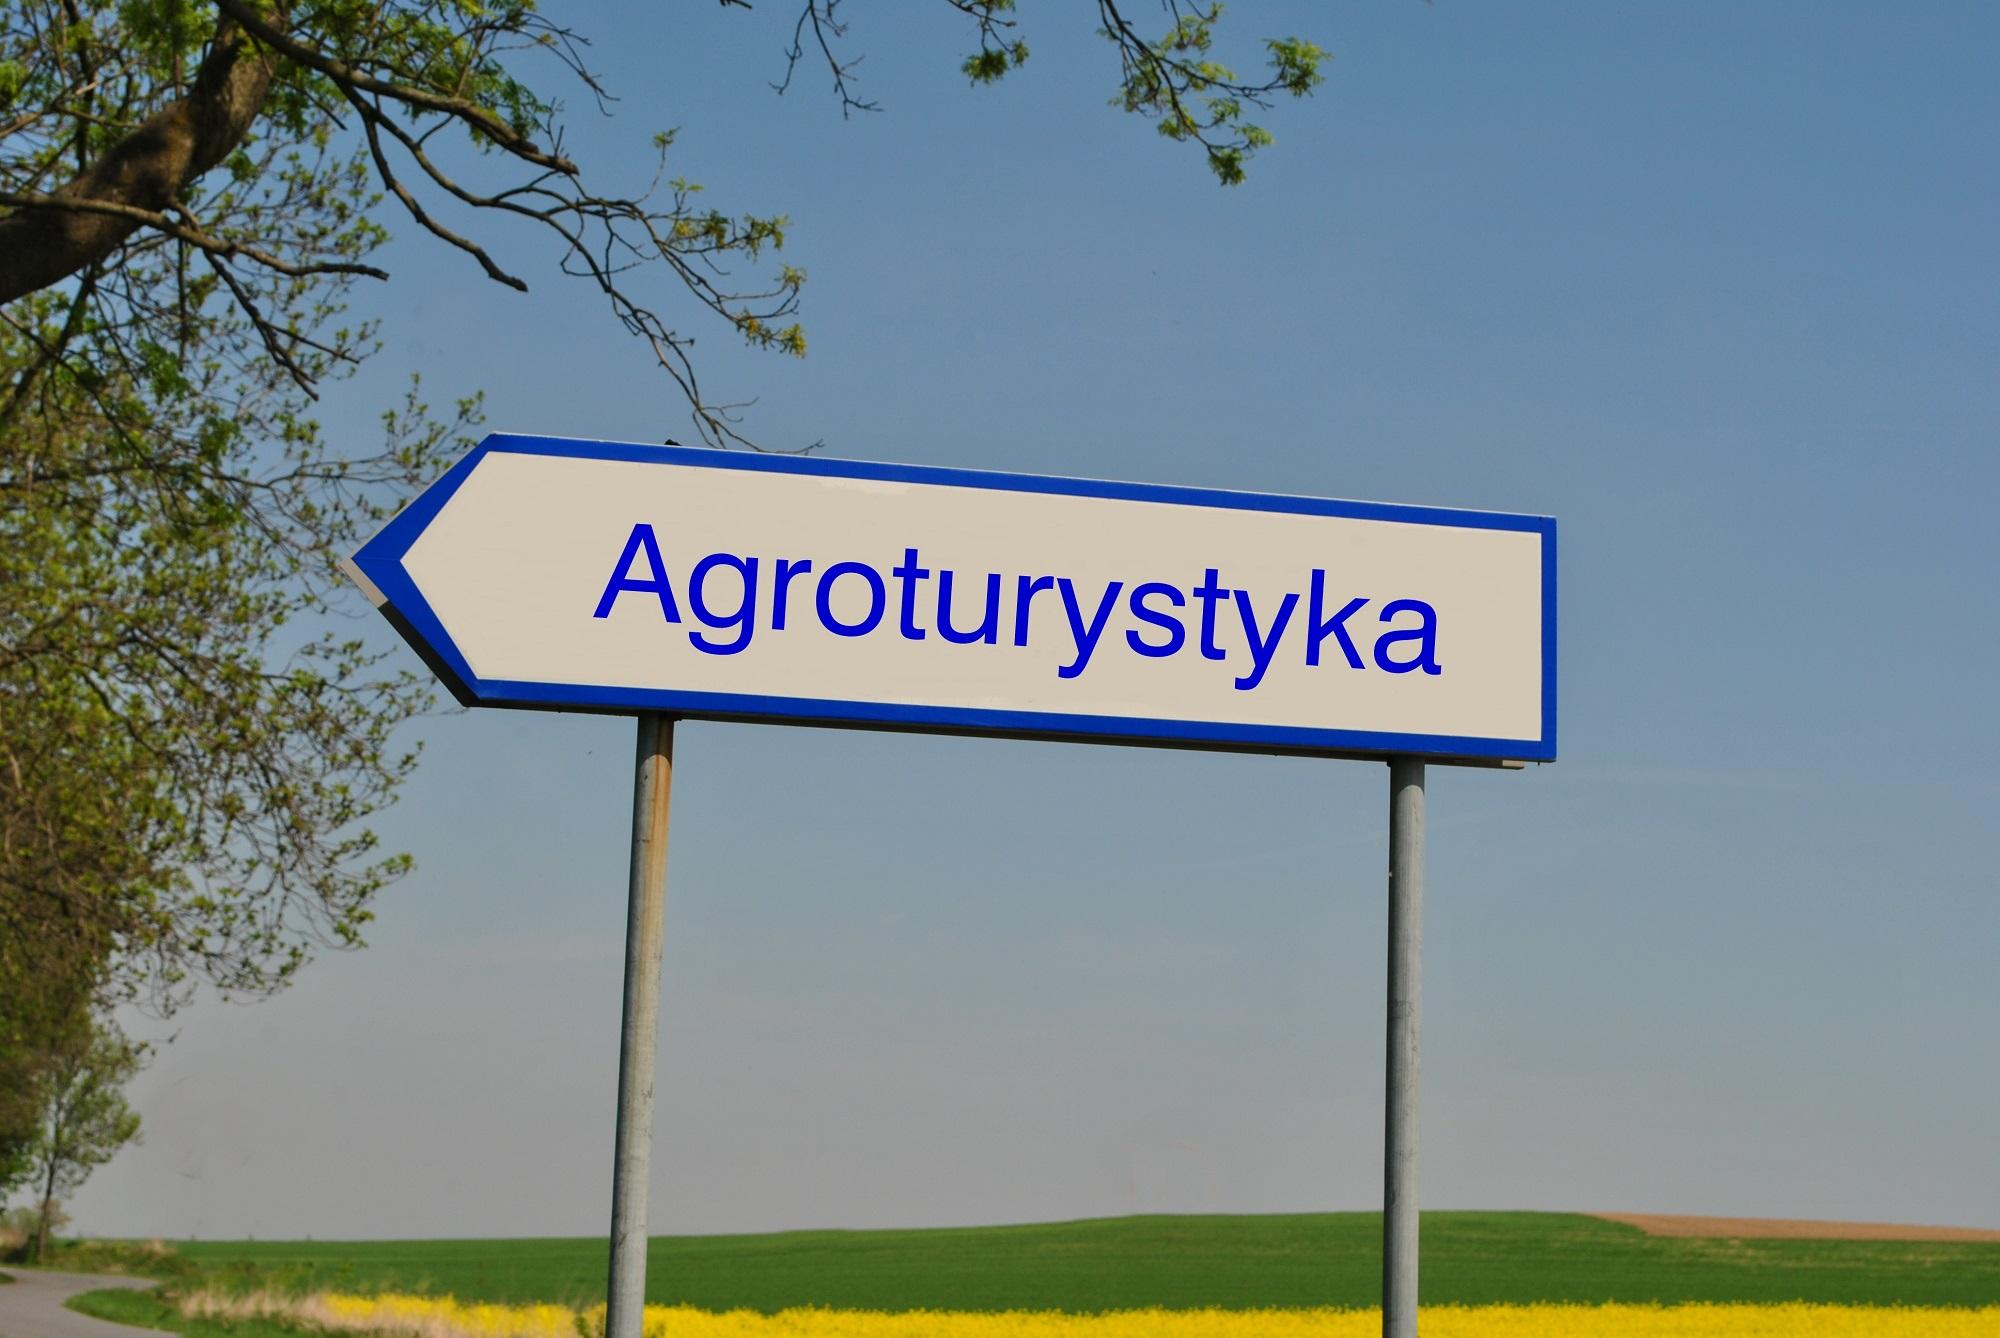 Gospodarstwo agroturystyczne kujawsko-pomorskie